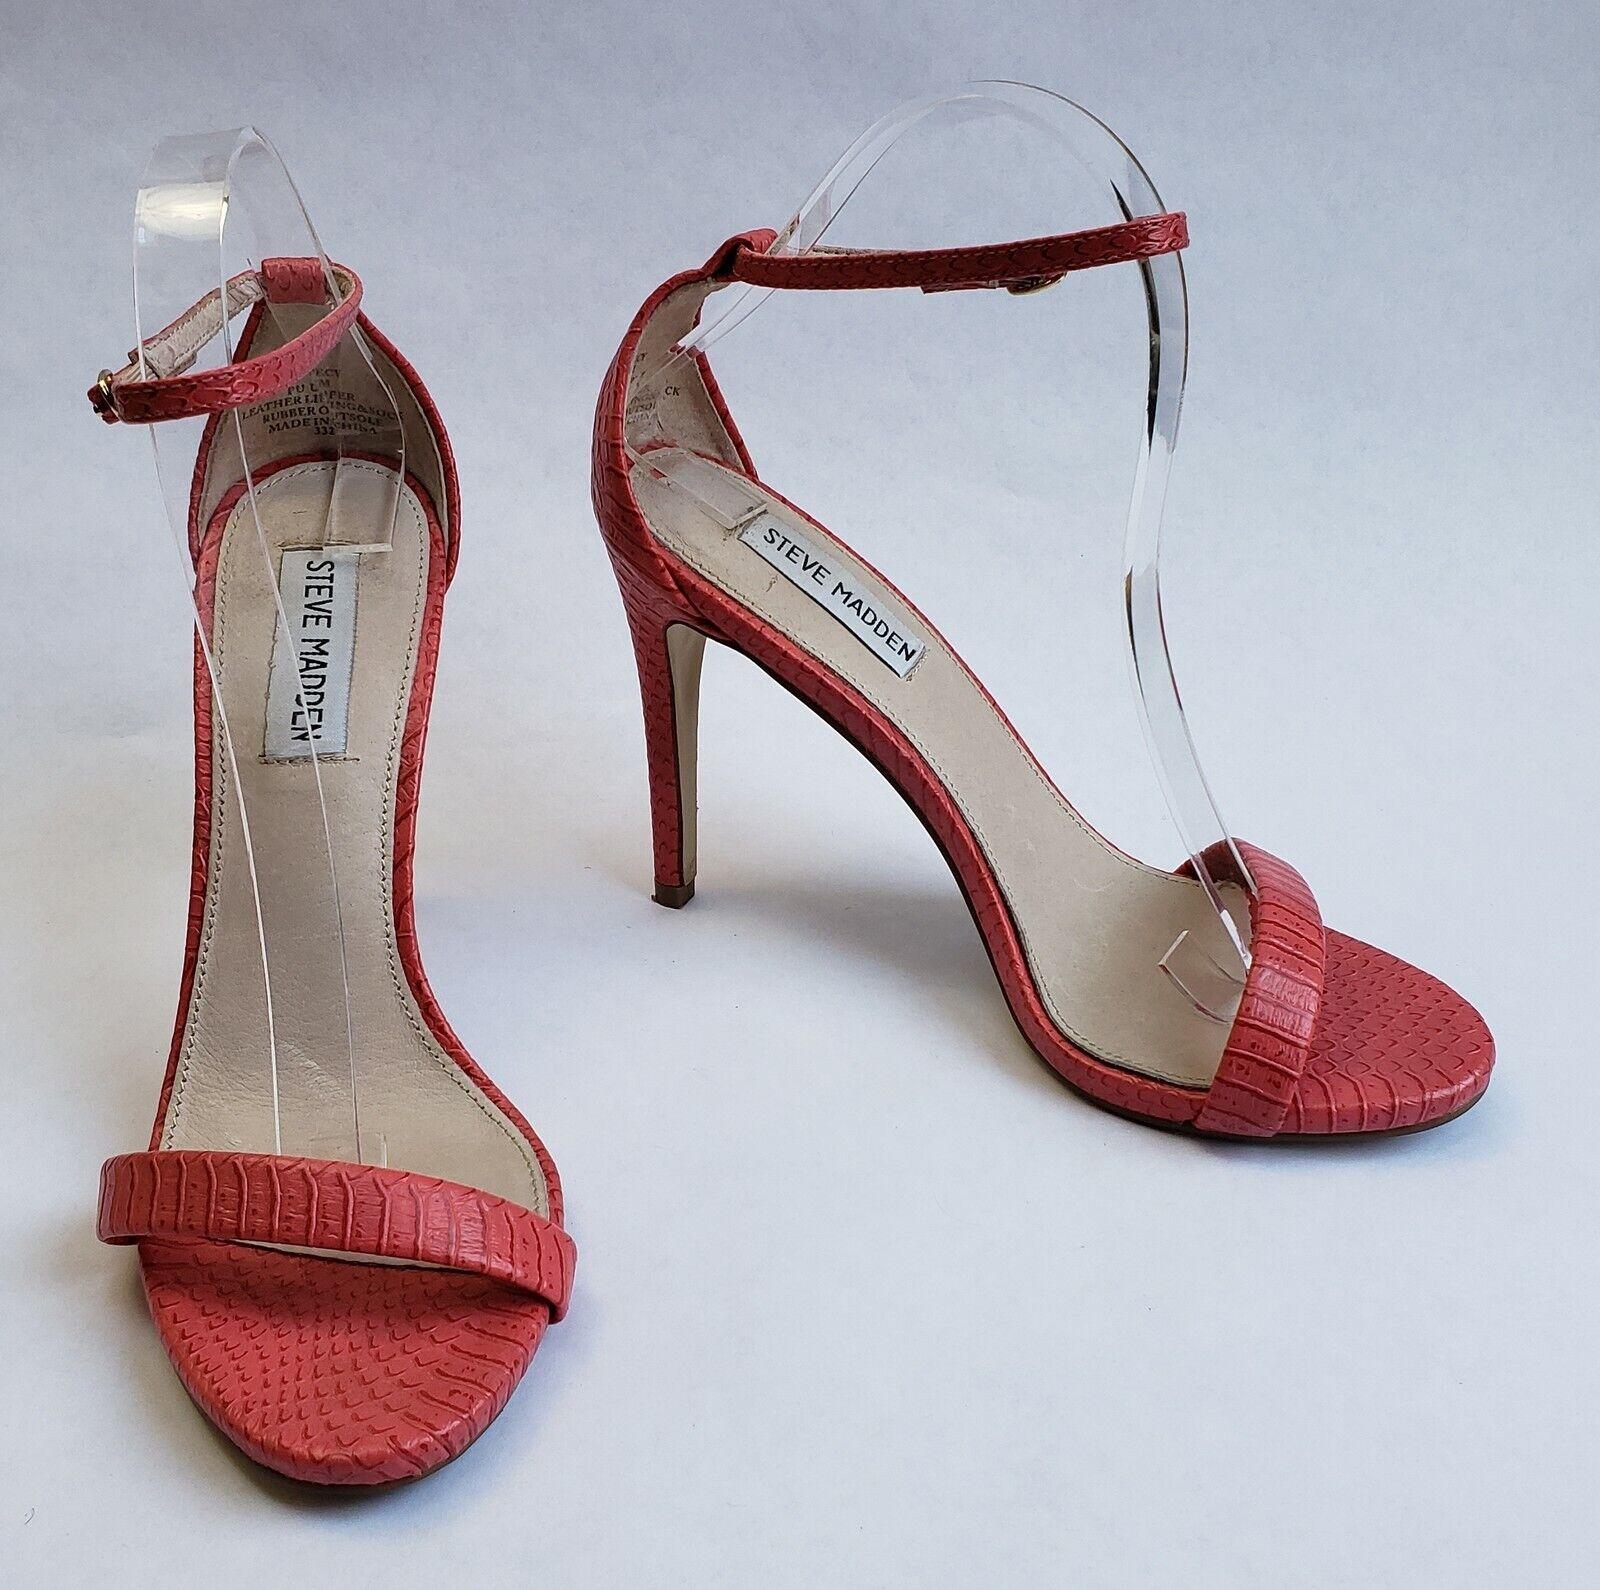 Steve Madden shoes Sandals orange Heels Snake Pattern Ankle Strap Womens Size 8M